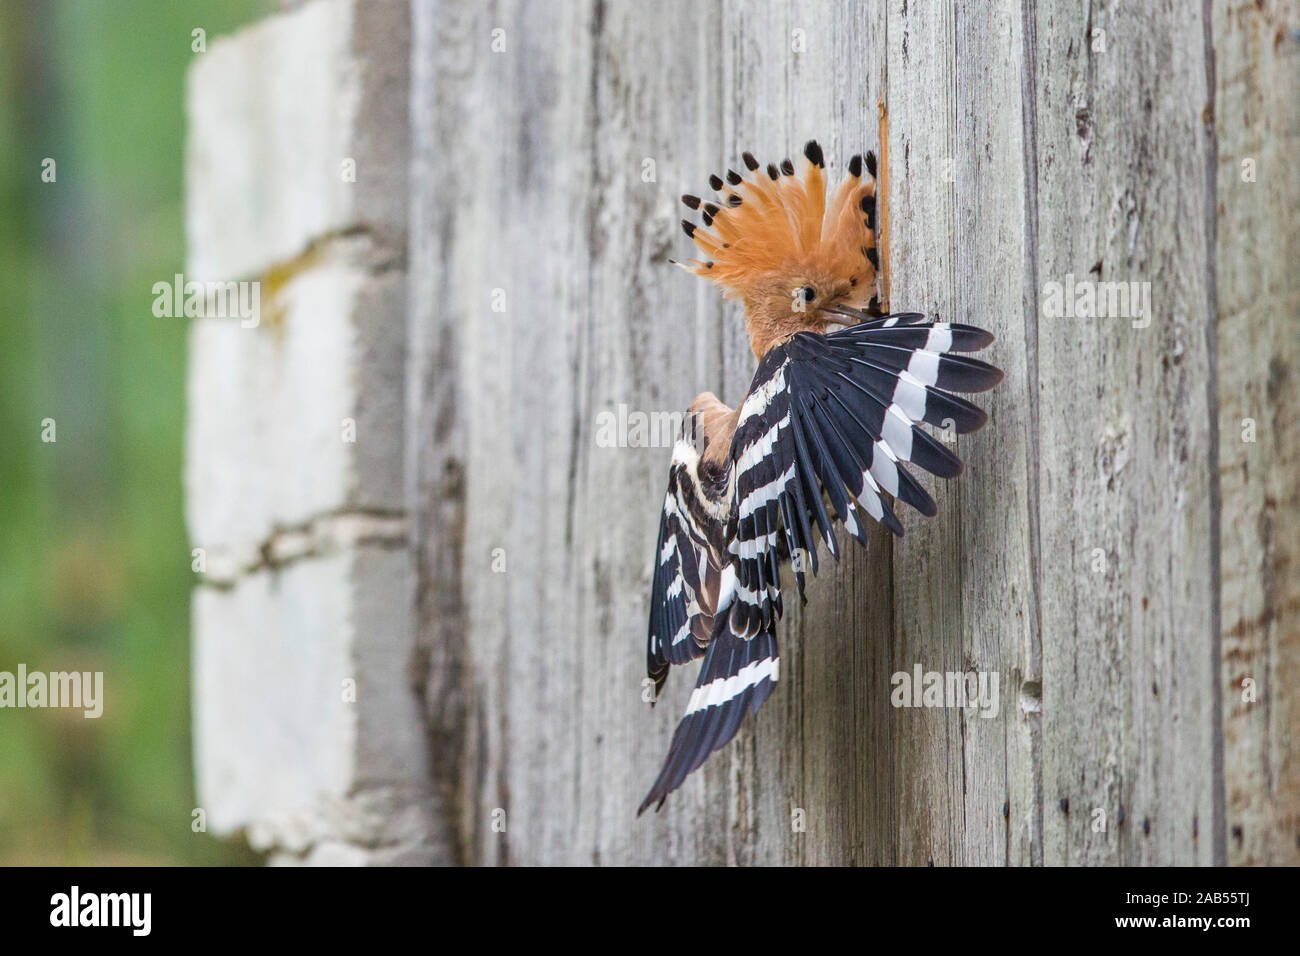 Wiedehopf (Upupa epops) Stock Photo